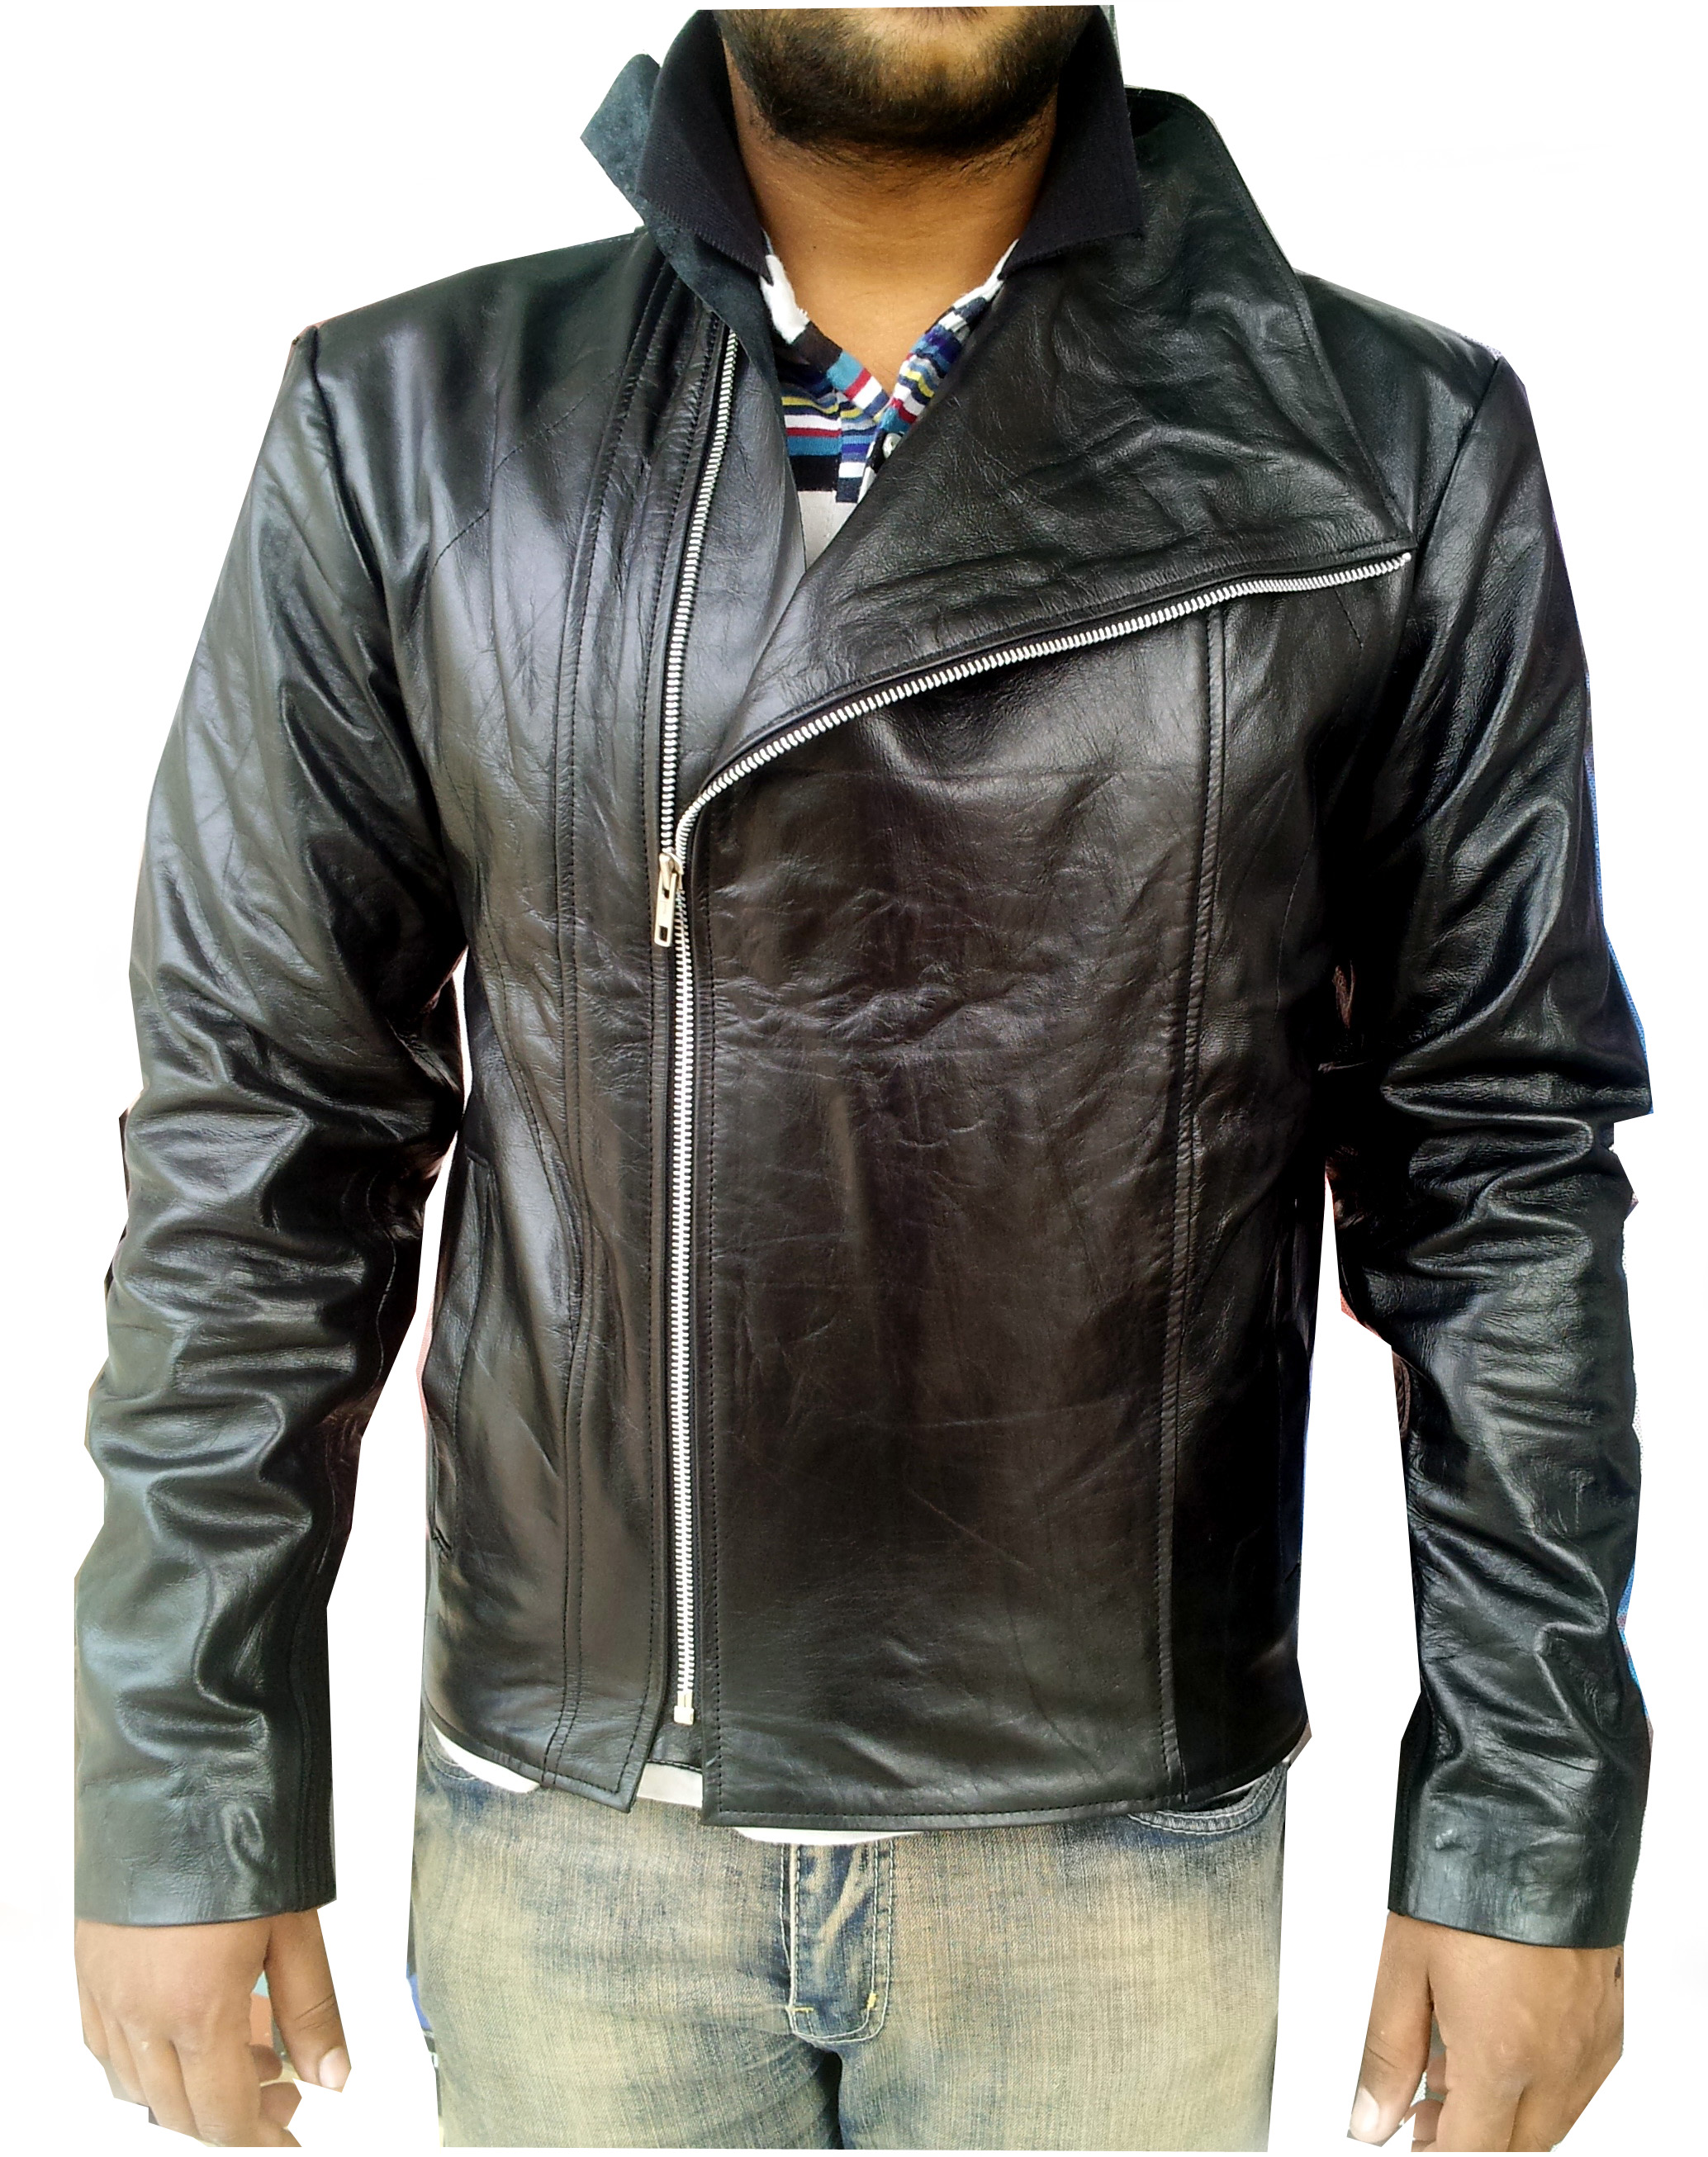 Men's jacket collar - Handmade New Men High Collar Soft Leather Jacket Men Leather Jacket Leather Jacket For